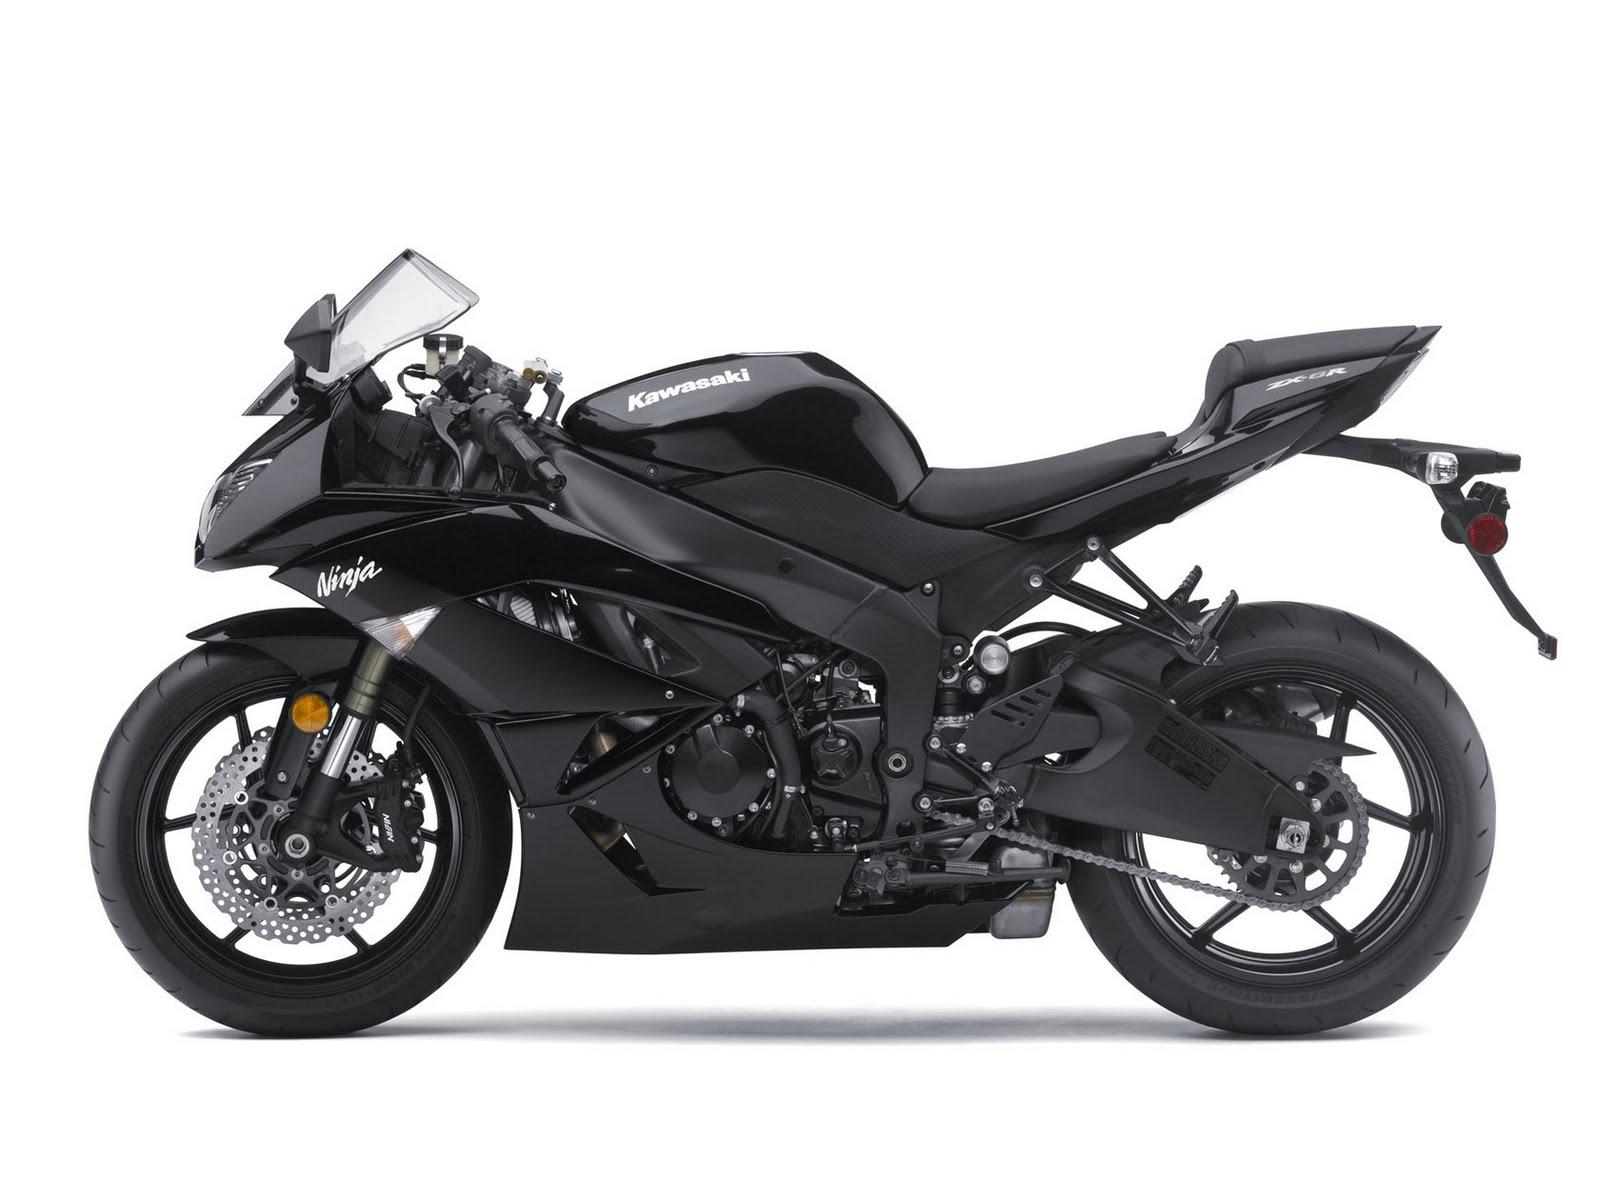 Fresh Motor Modification: Kawasaki Ninja ZX-6R New Pictures